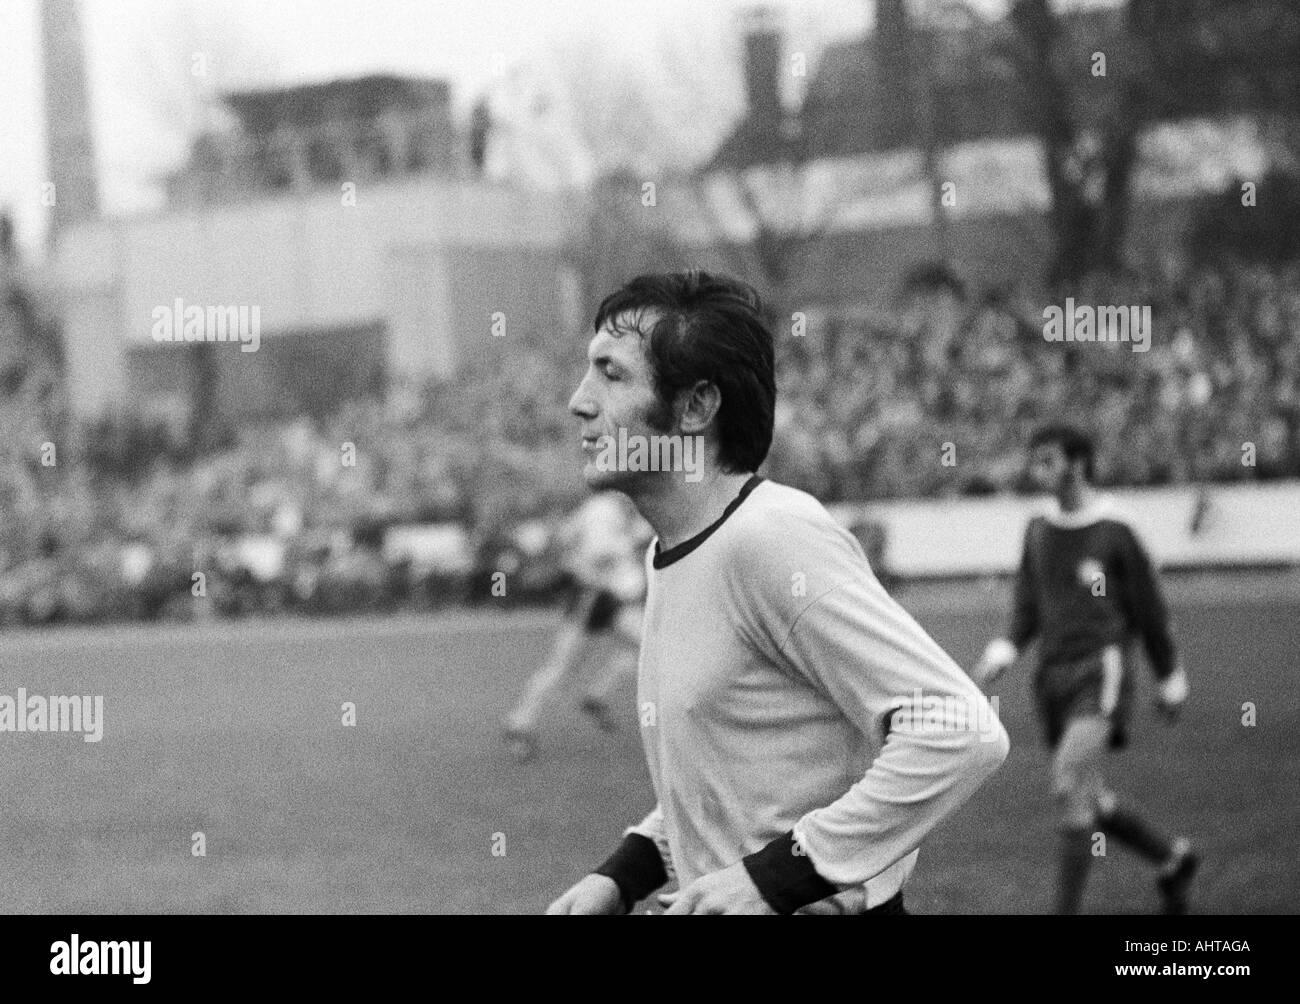 football, Bundesliga, 1971/1972, VfL Bochum versus Borussia Dortmund 4:2, Stadium at the Castroper Strasse in Bochum, football player, Branco Rasovic (BVB) - Stock Image